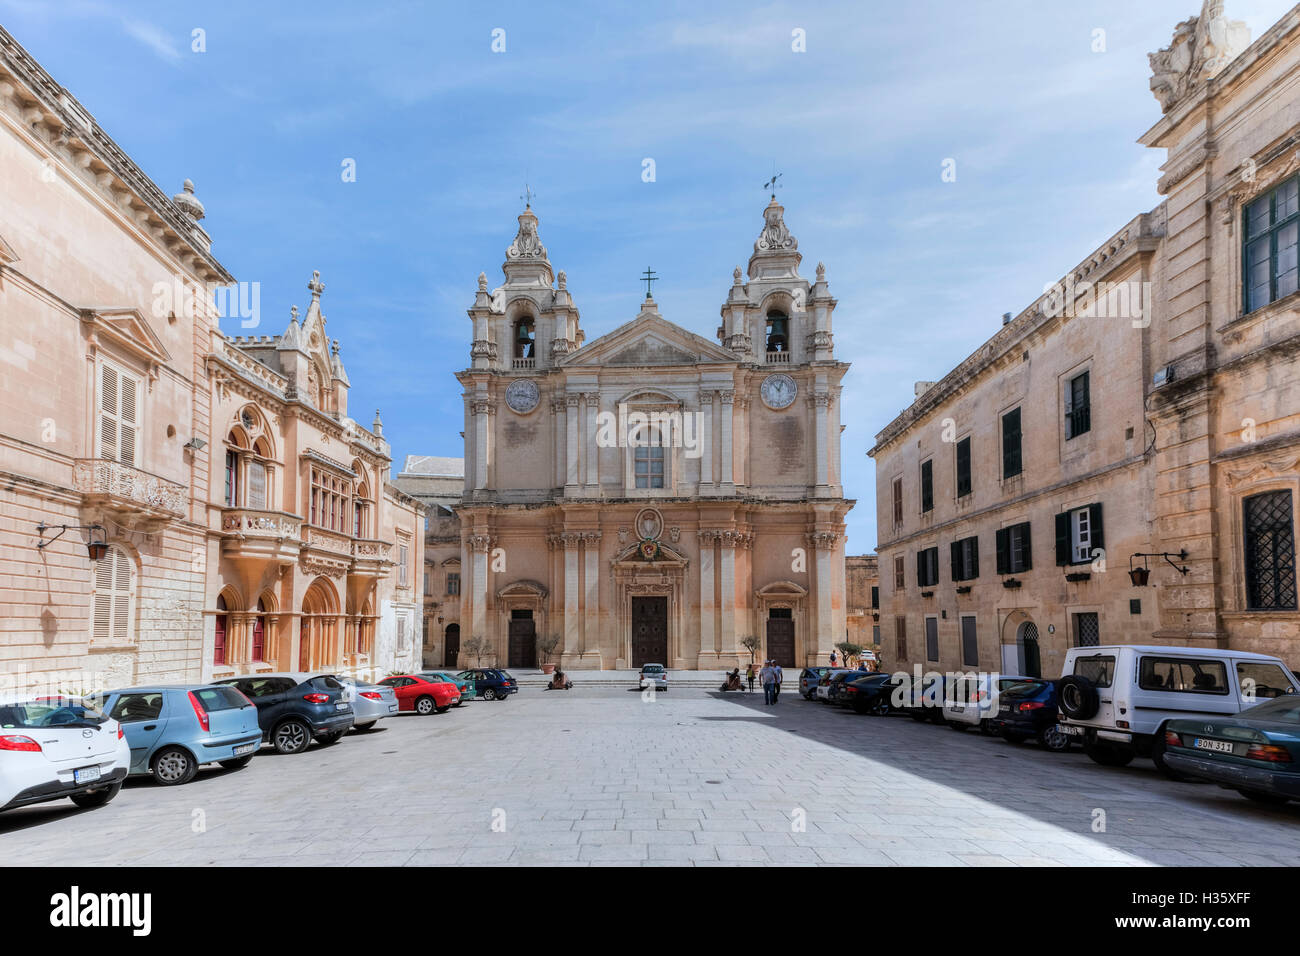 cathedral, Mdina, Malta - Stock Image